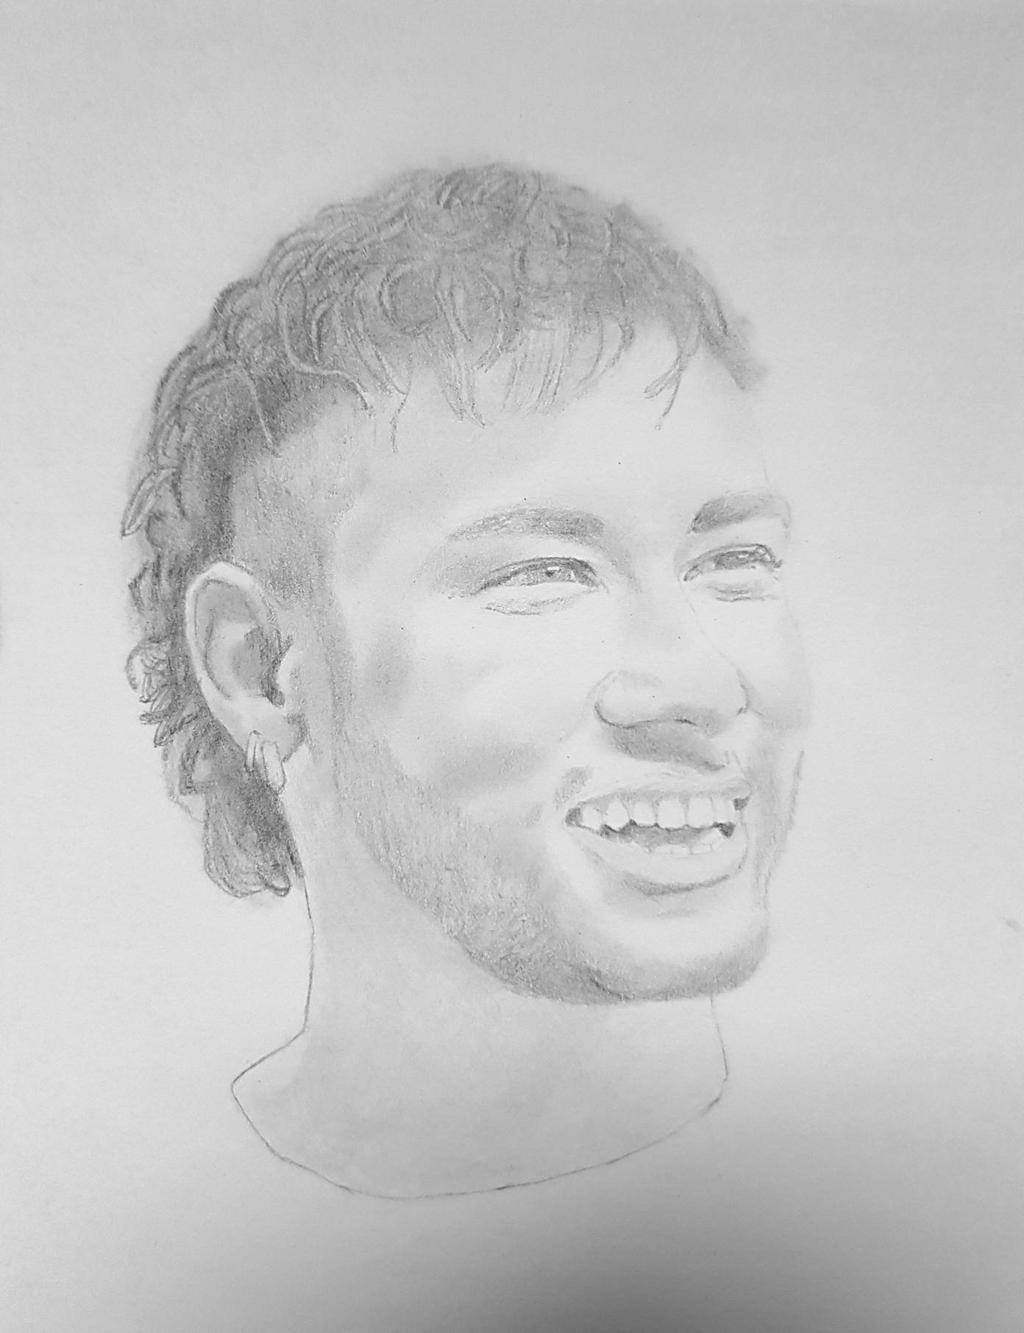 Neymar jr pencil drawing by stemito on deviantart